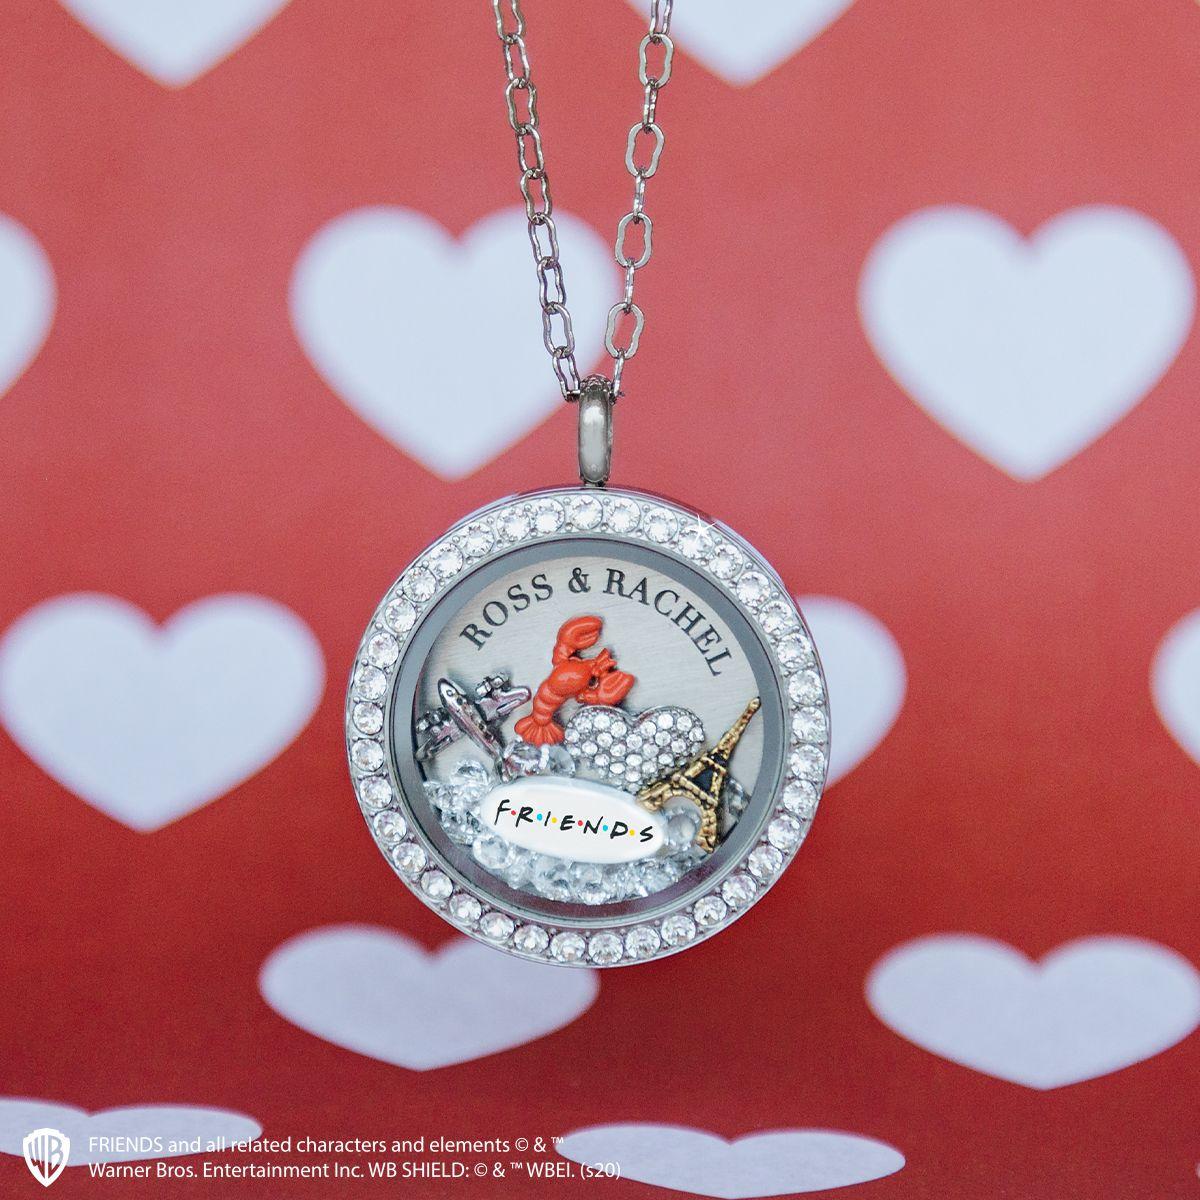 Ross Rachel Friends In 2020 Origami Owl Custom Jewelry Origami Owl Jewelry Diy Gifts For Friends